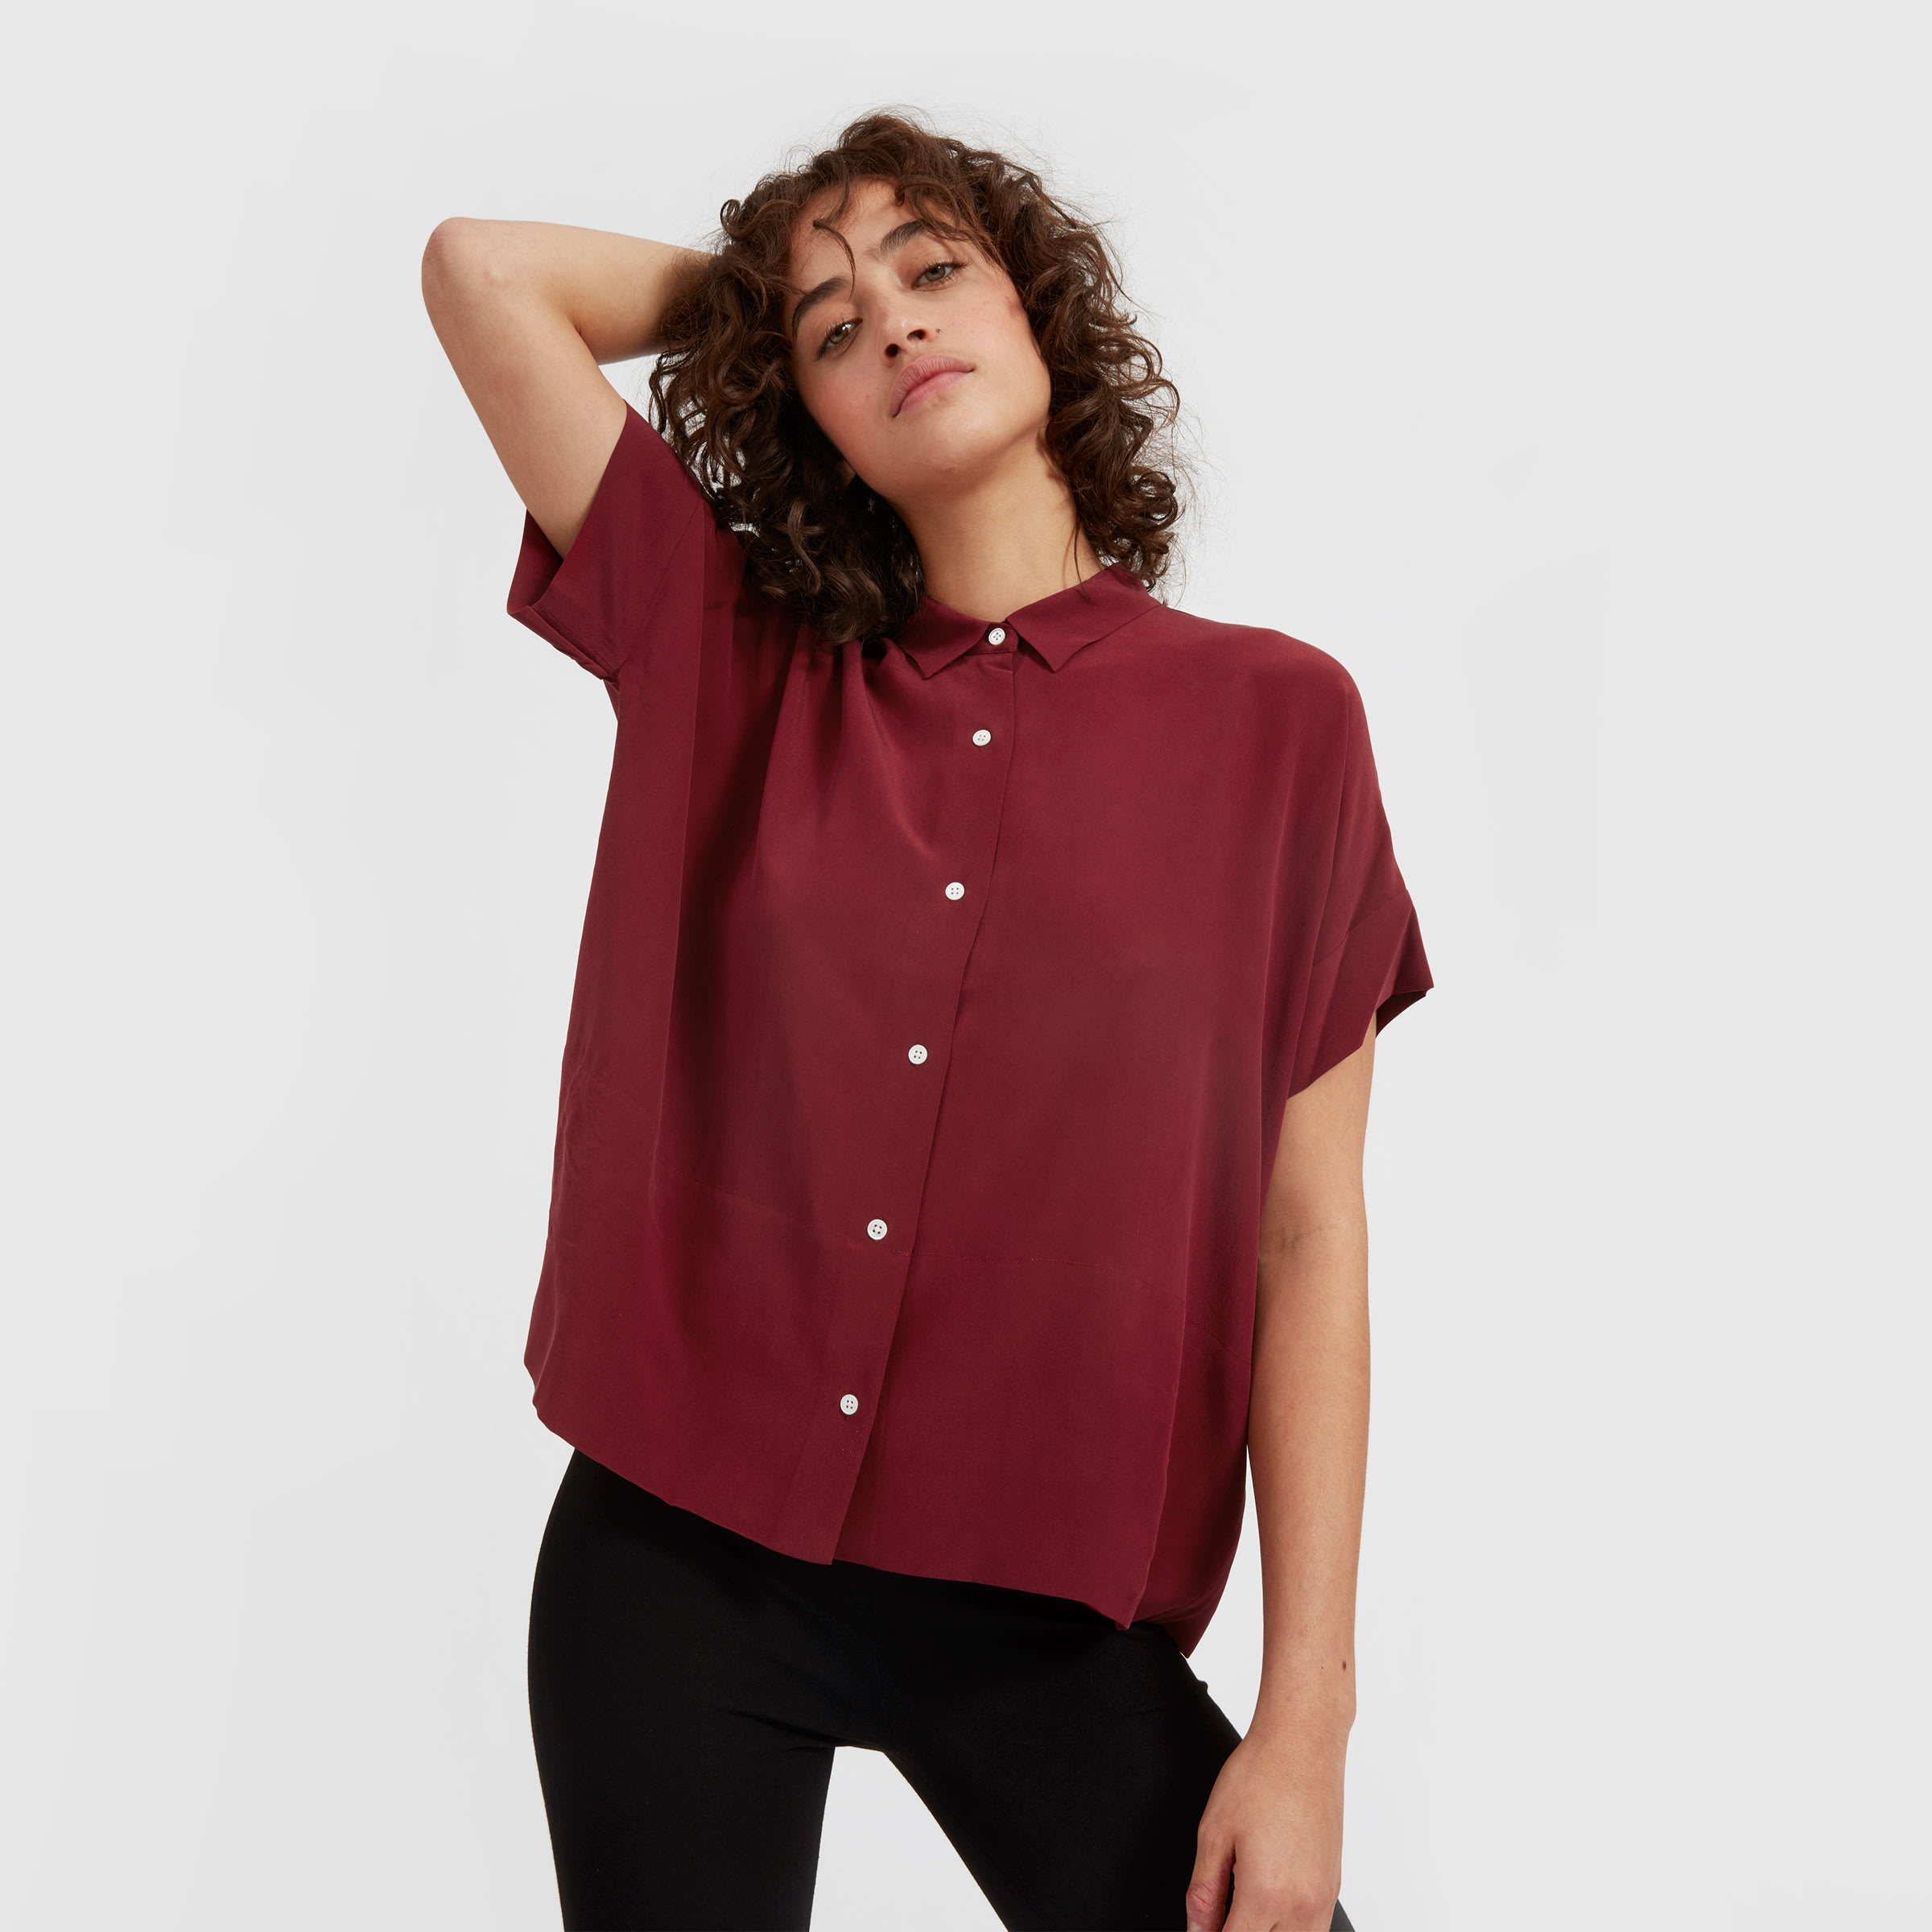 ab3cb742f0f4e The Silk Short-Sleeve Square Shirt —  88